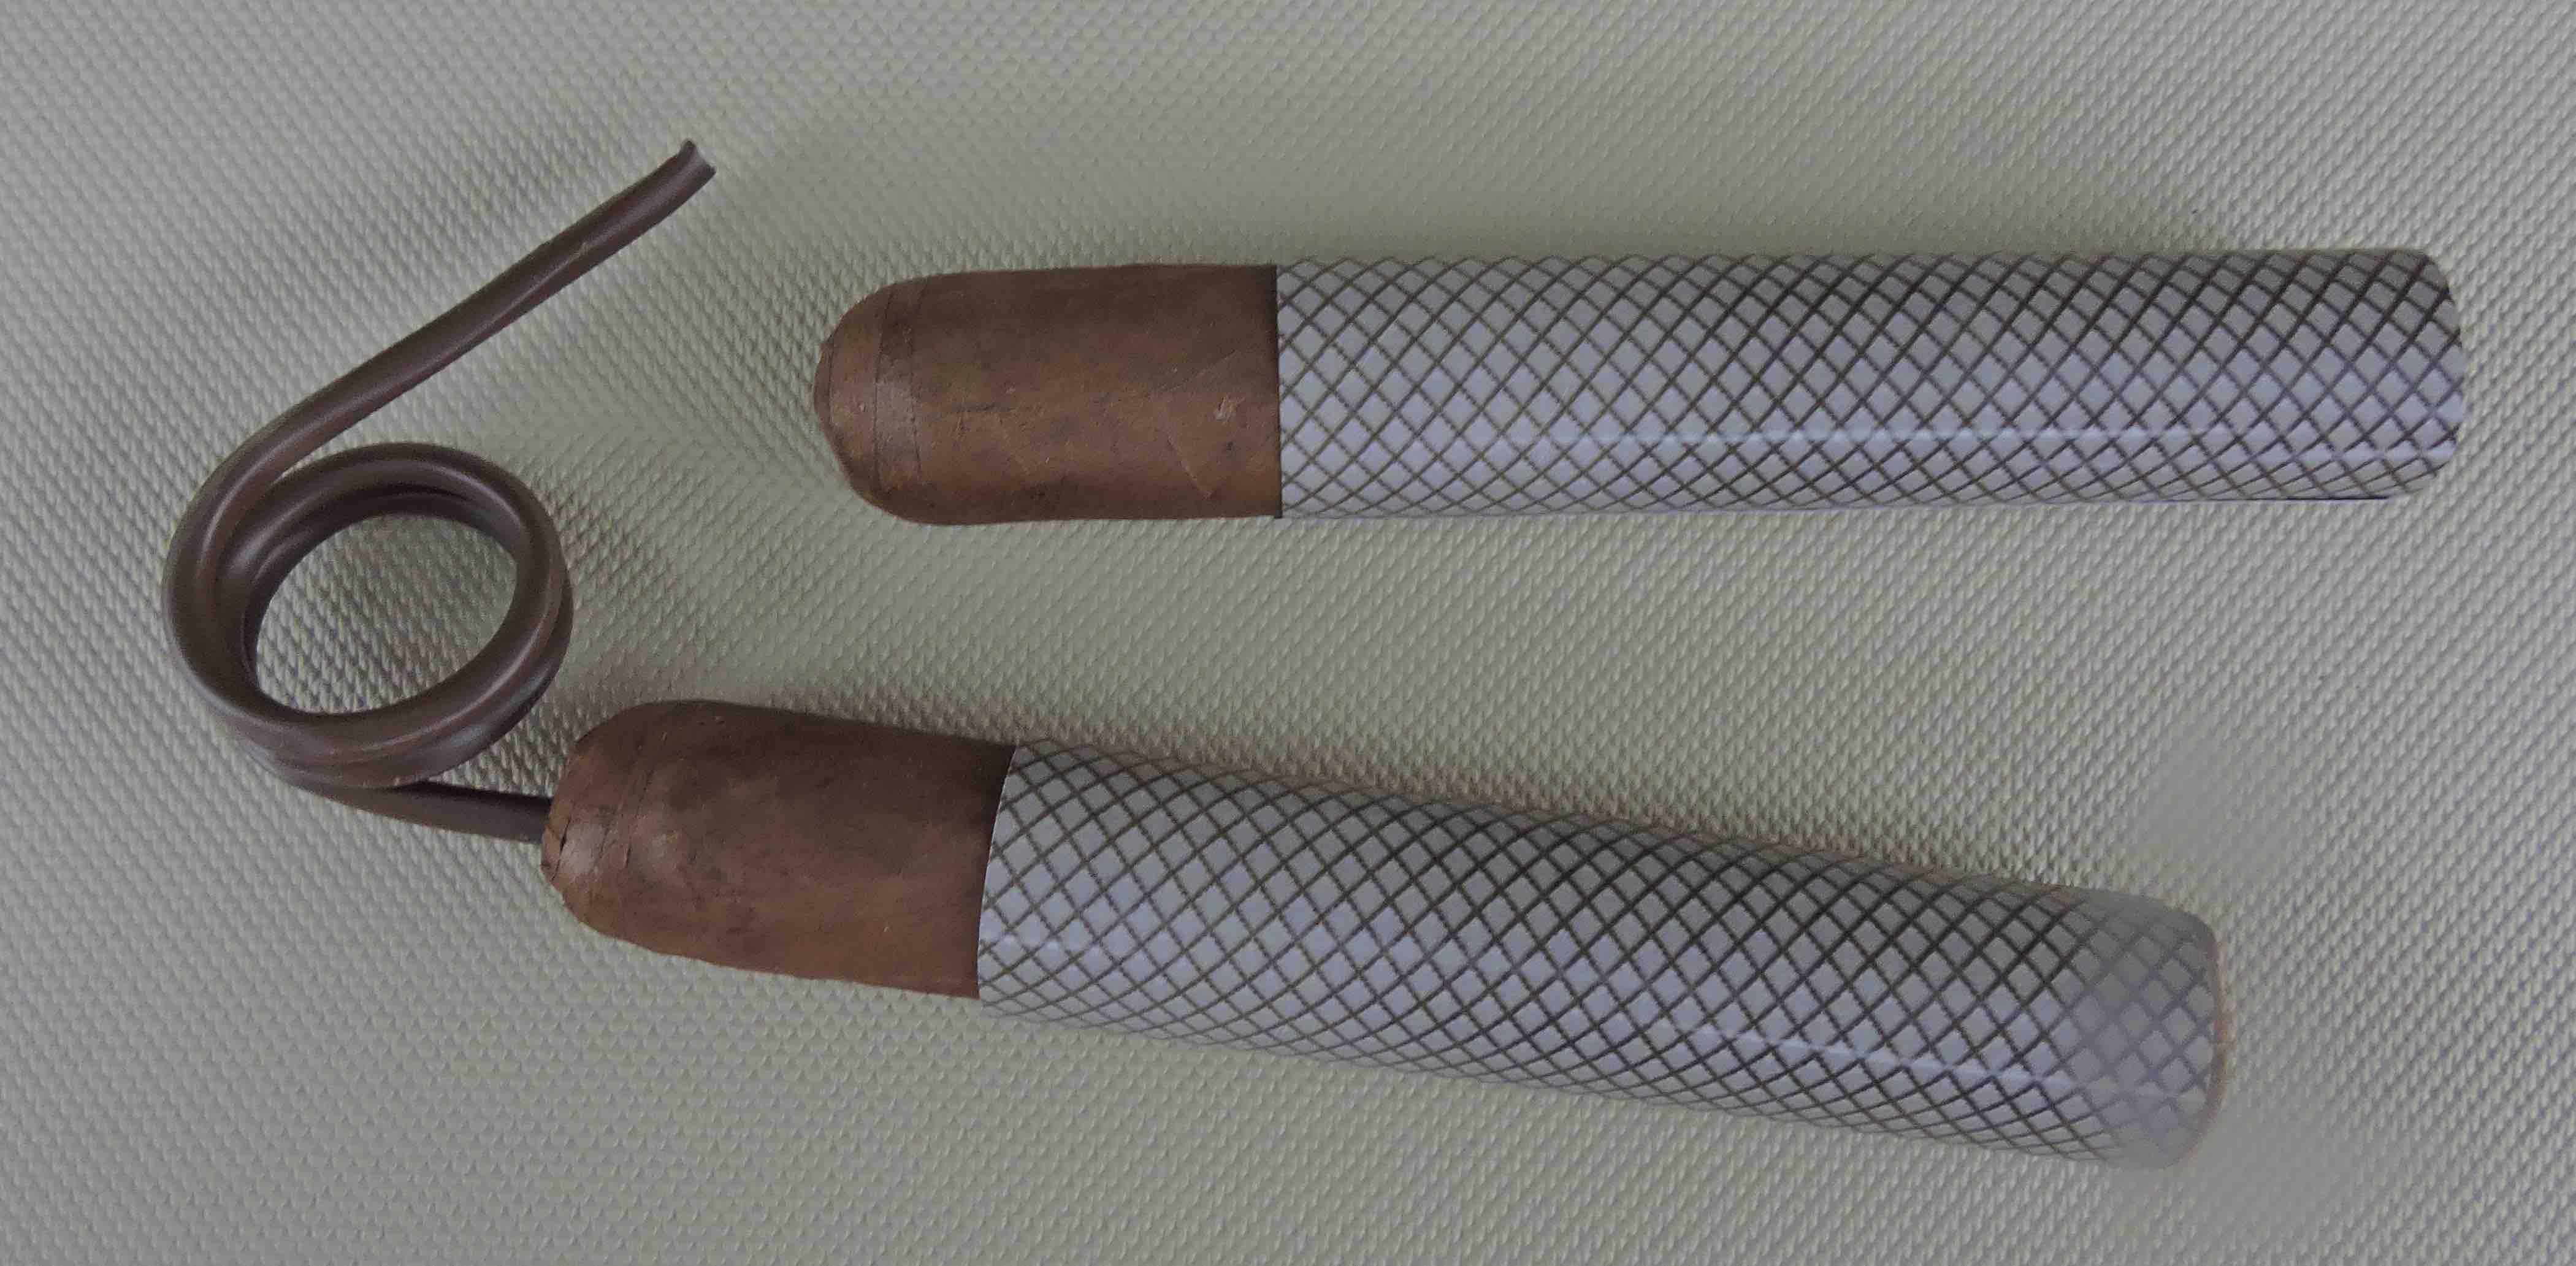 MoyaRuiz Hand Gripper Split